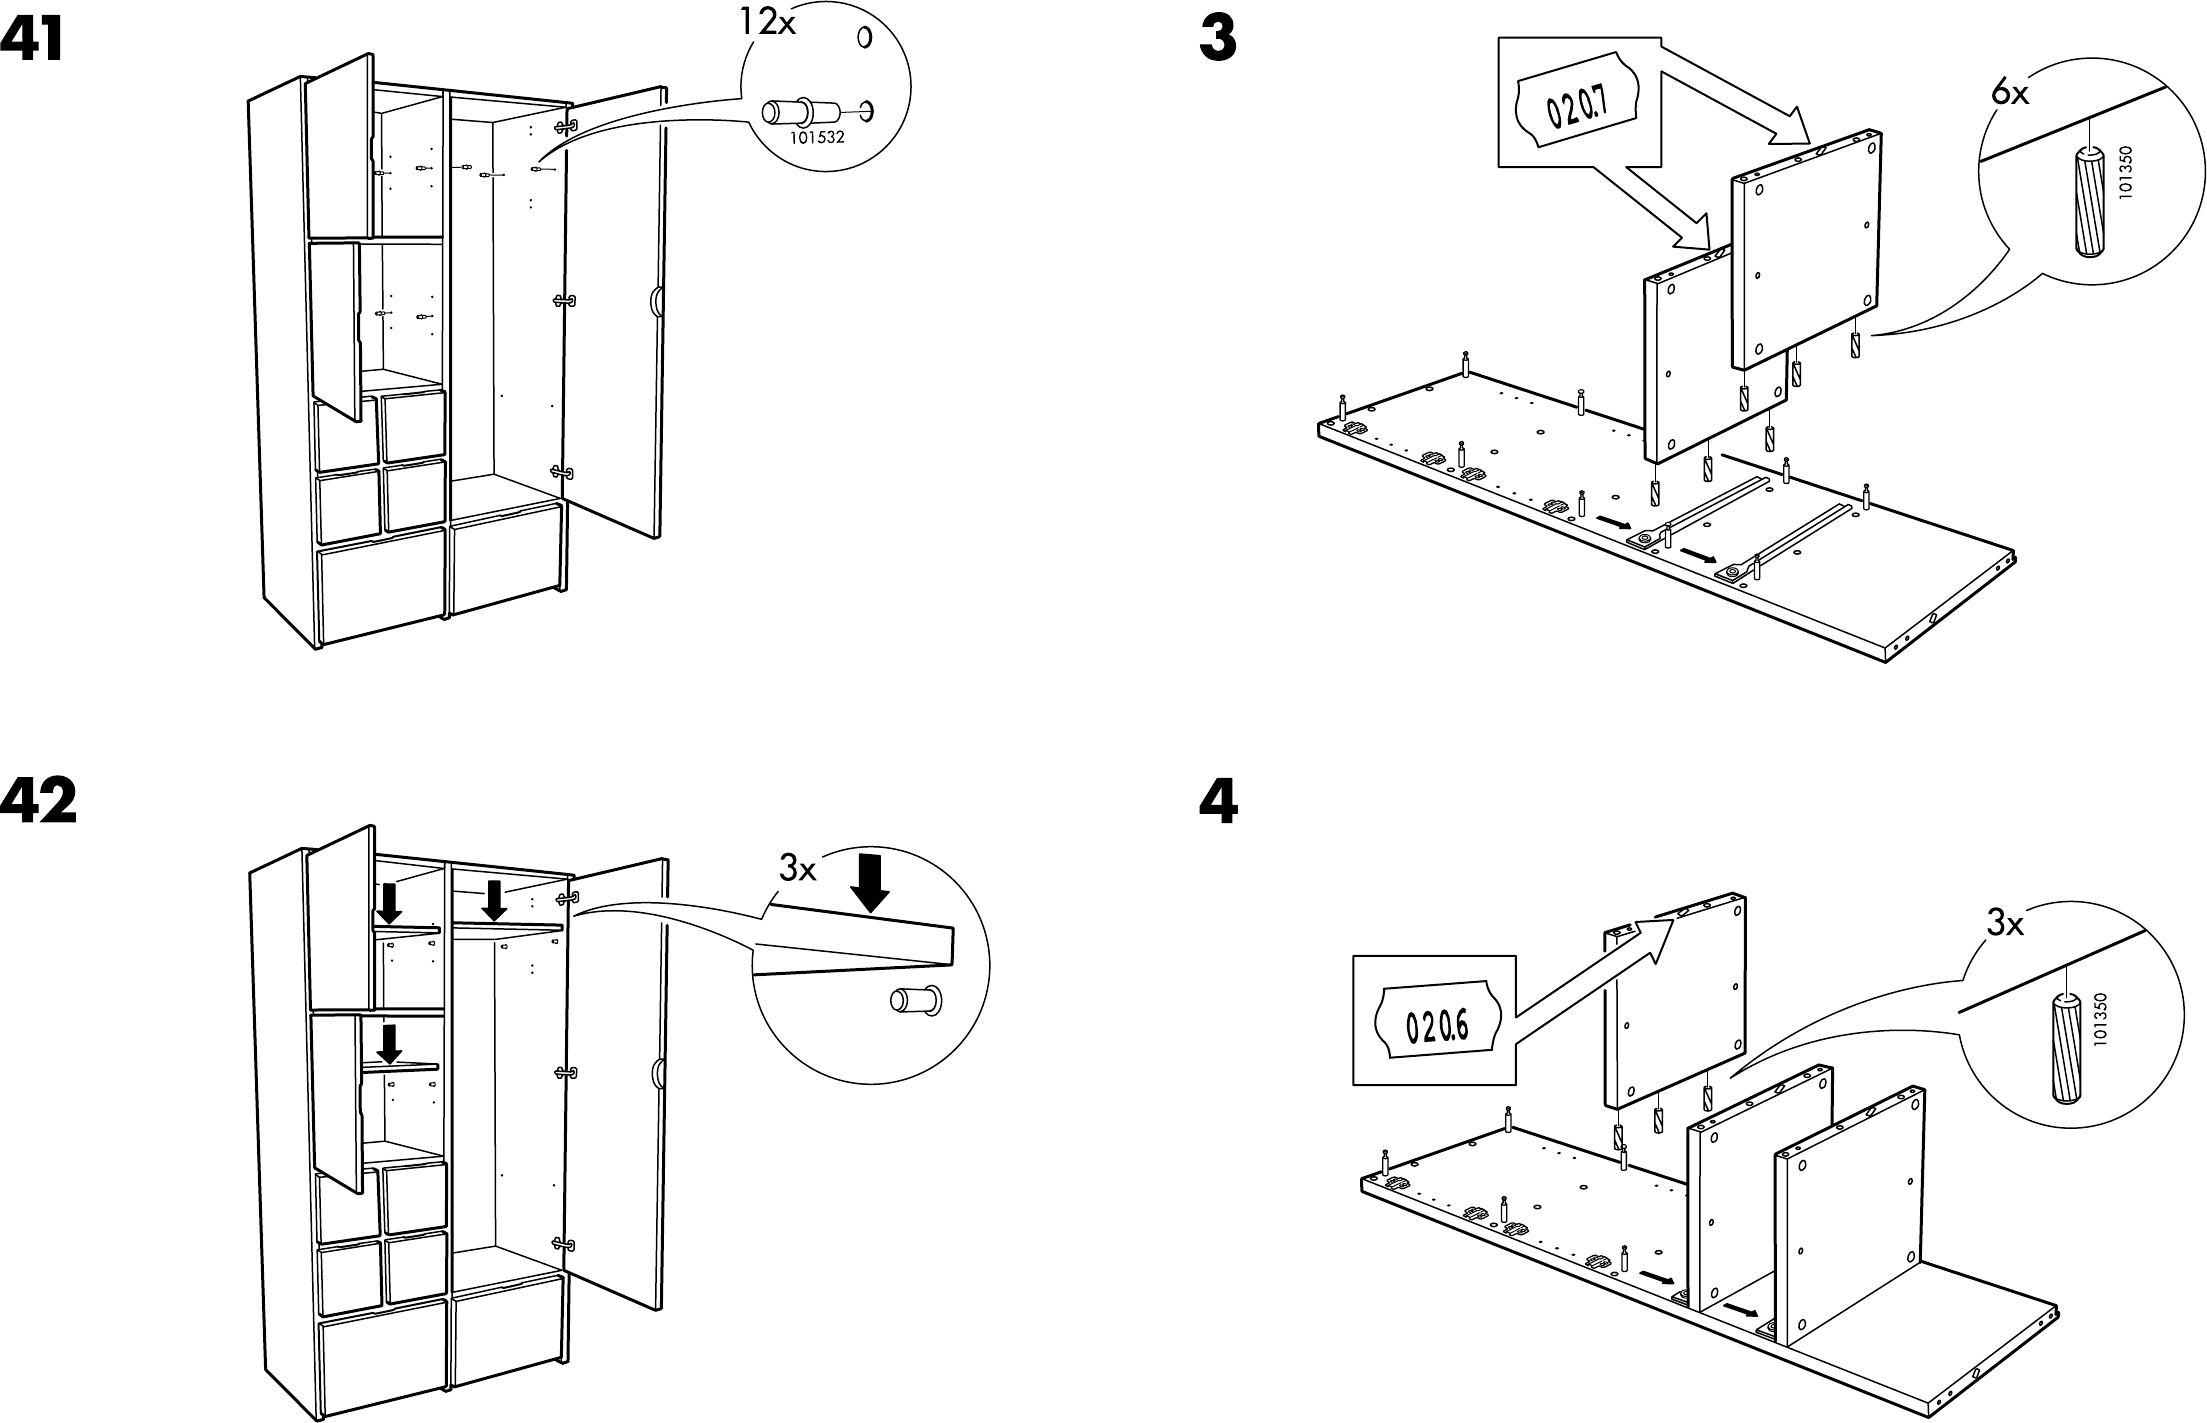 Ikea Ideas For Small Living Room ~ Handleiding Ikea Rakke kast (pagina 5 van 12) (Dansk, Deutsch, English